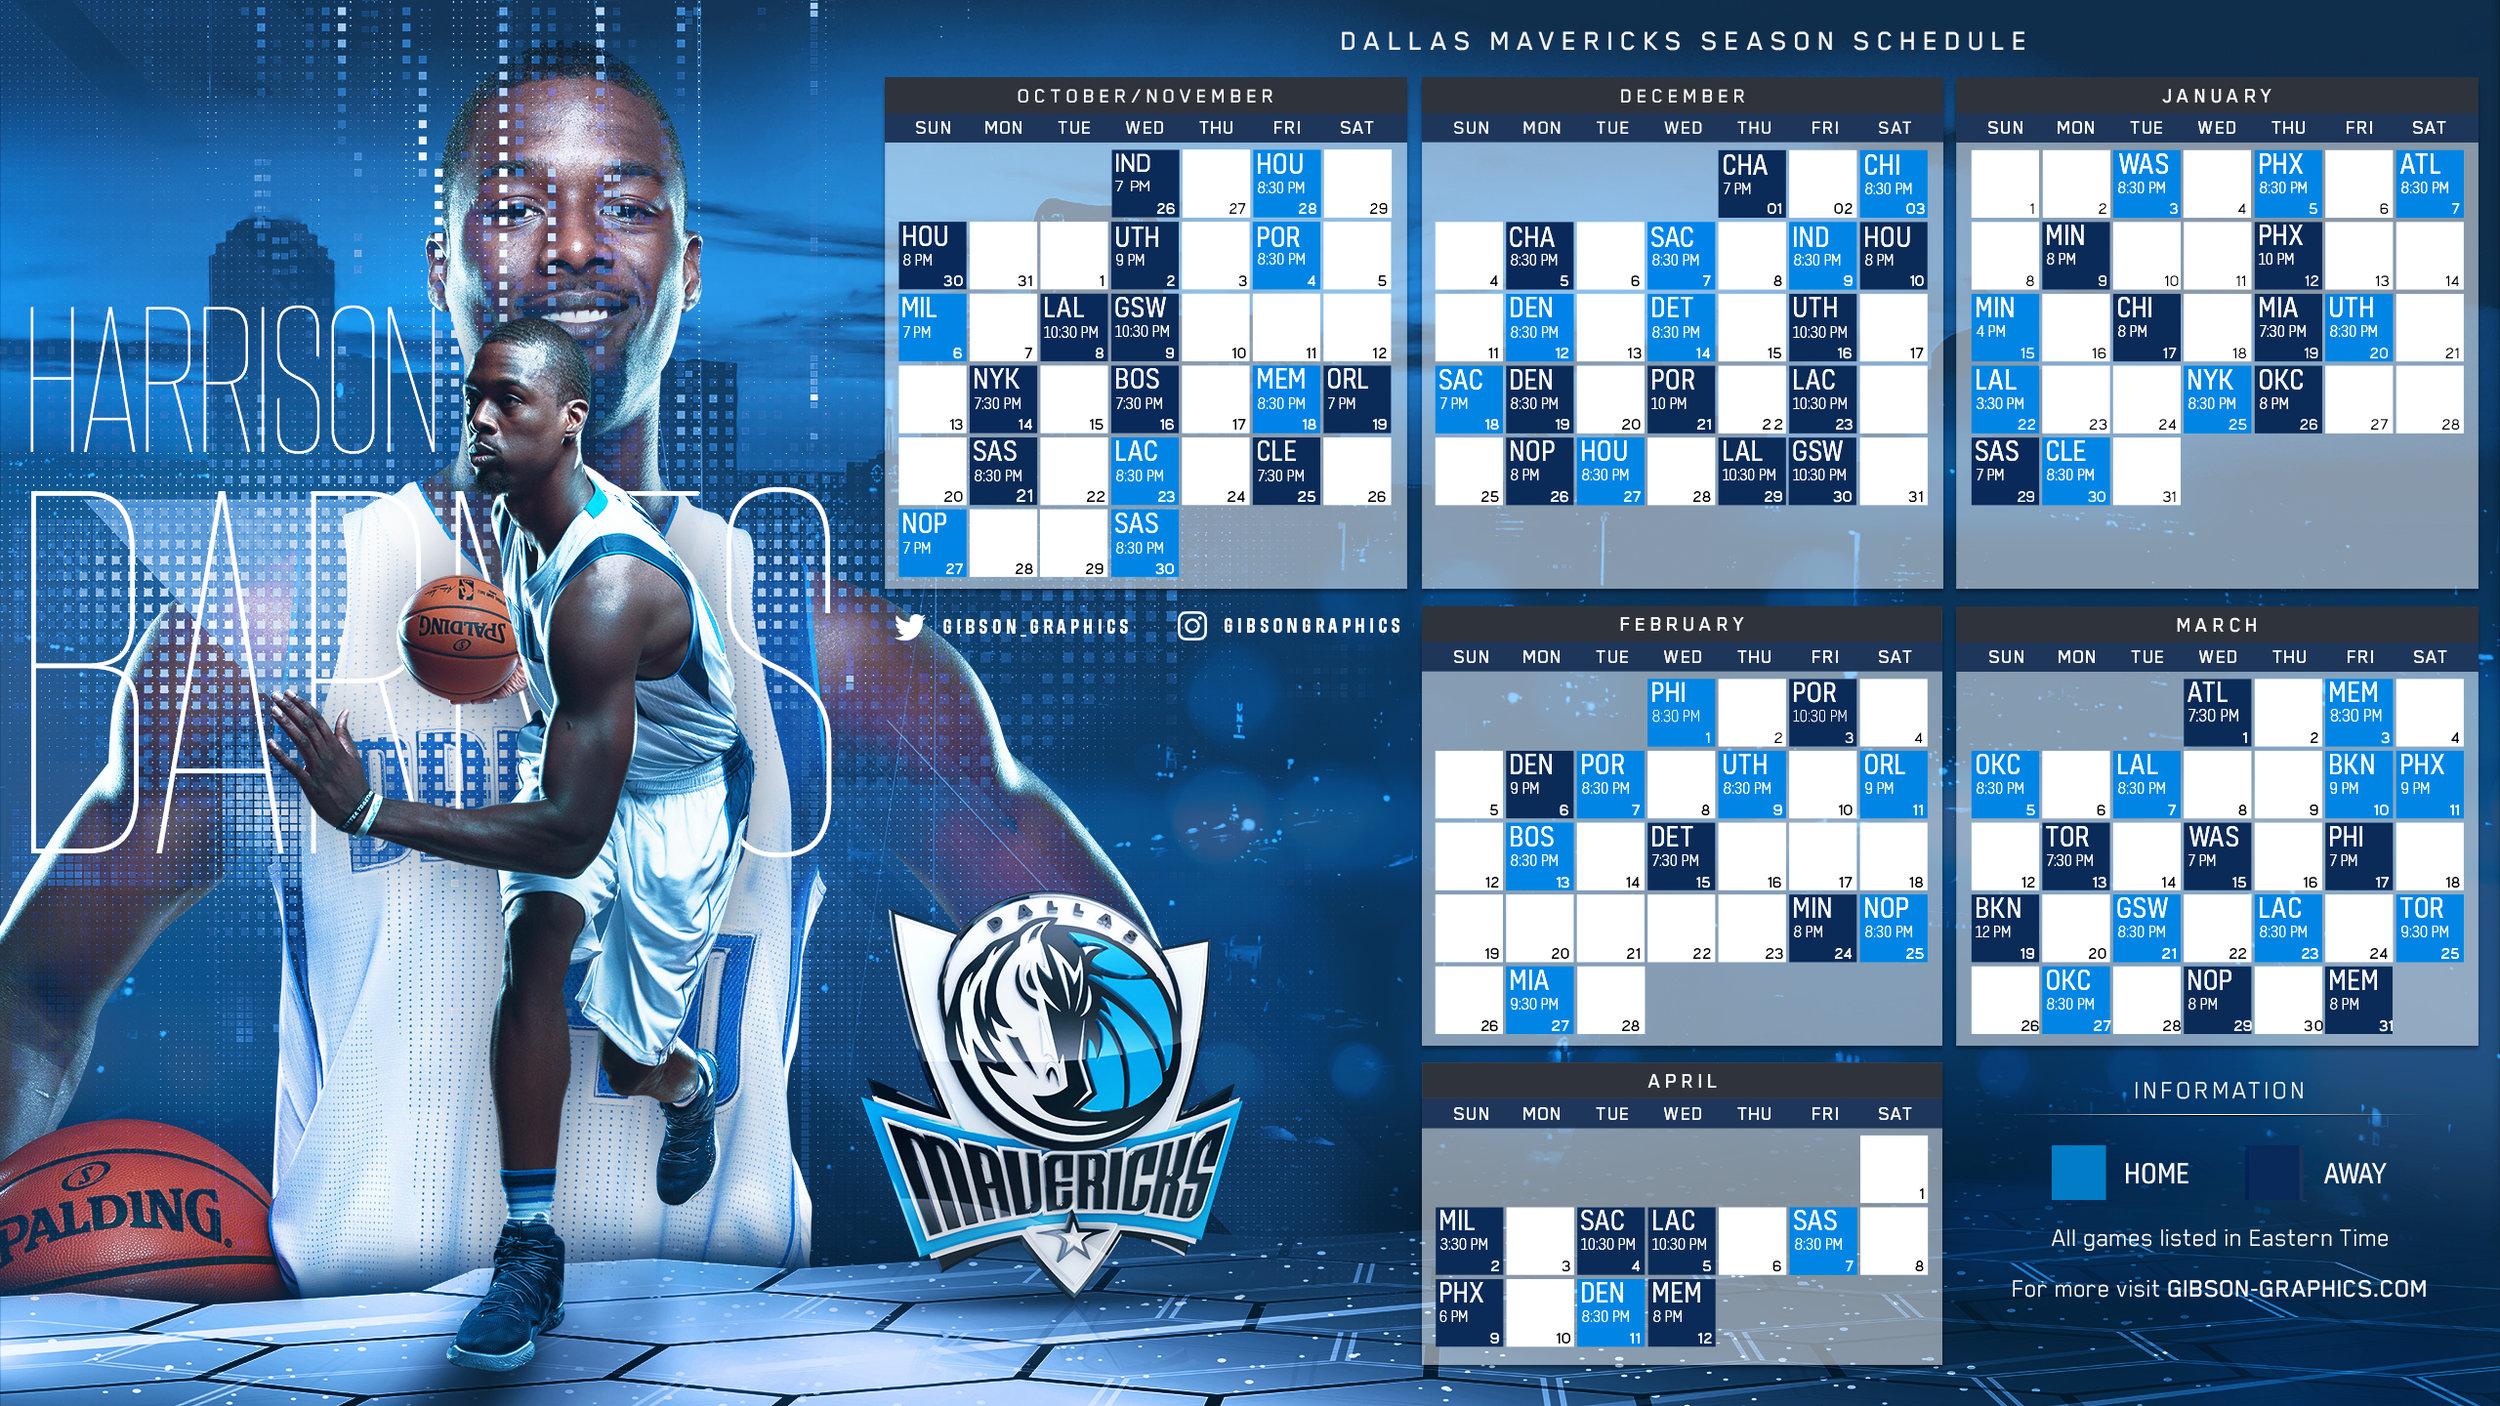 Harrison Barnes Schedule Wallpaper